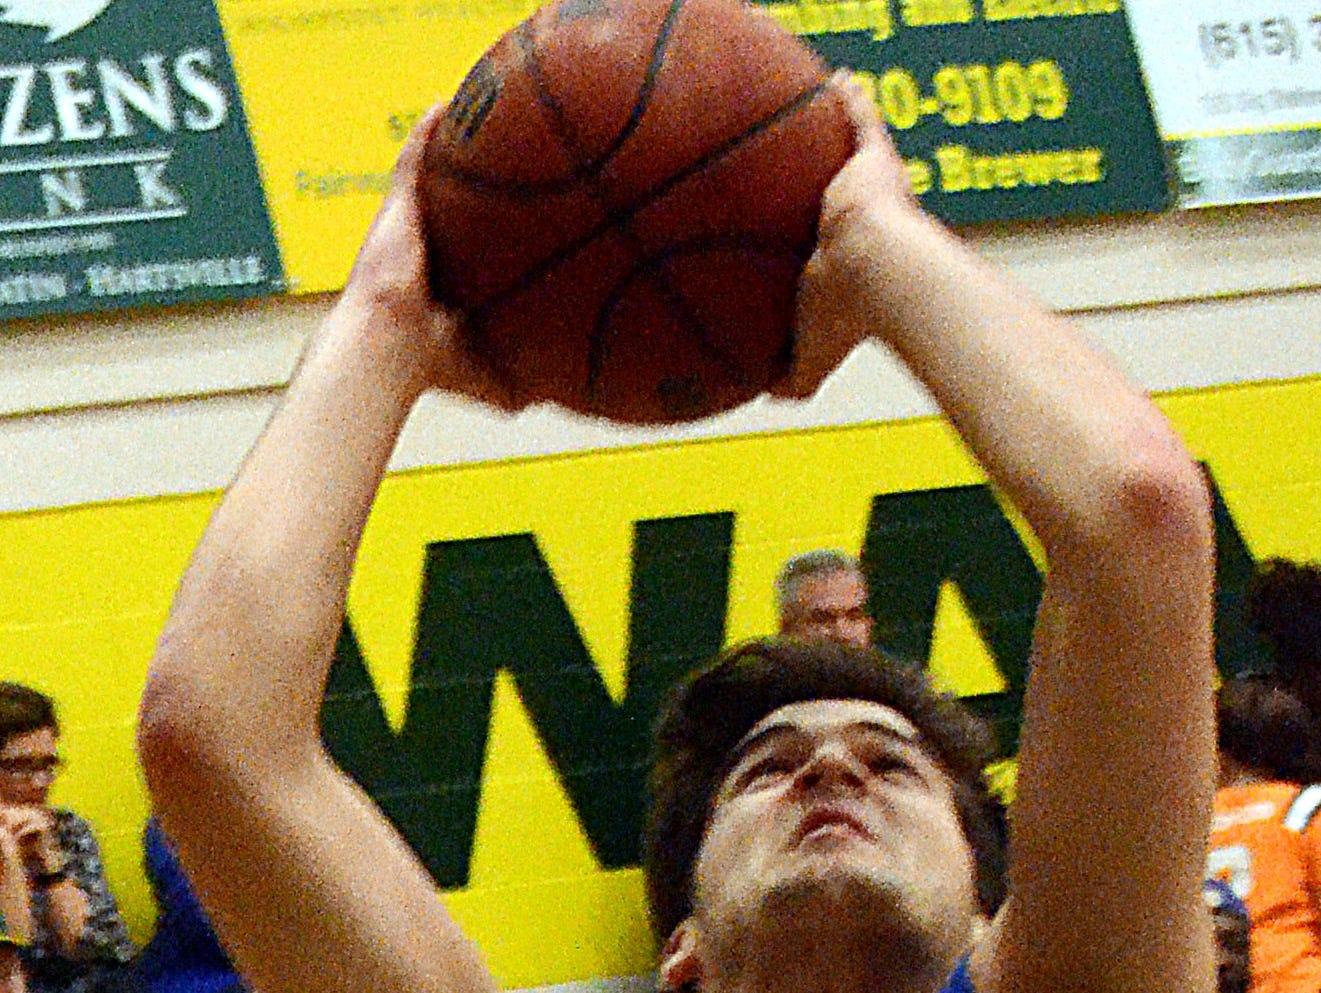 White House High freshman center Cameron Baldwin elevates for a first-quarter shot. Baldwin scored three points.